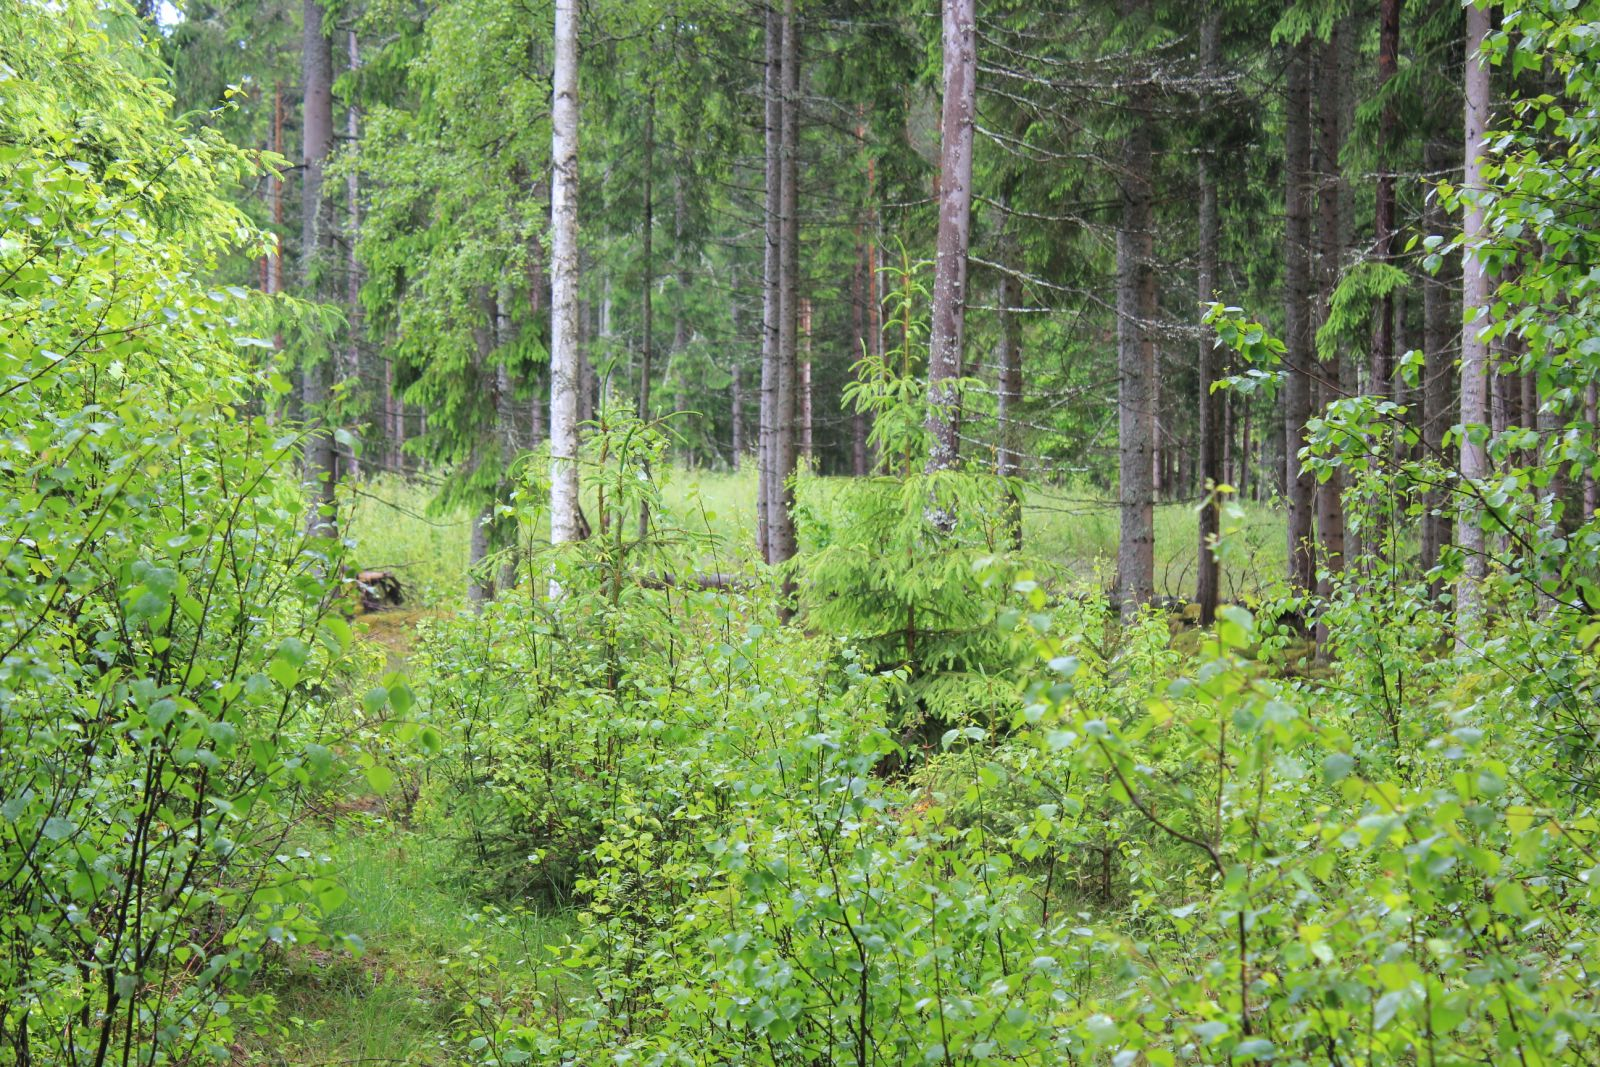 Grytet skymtas precis i skogskanten